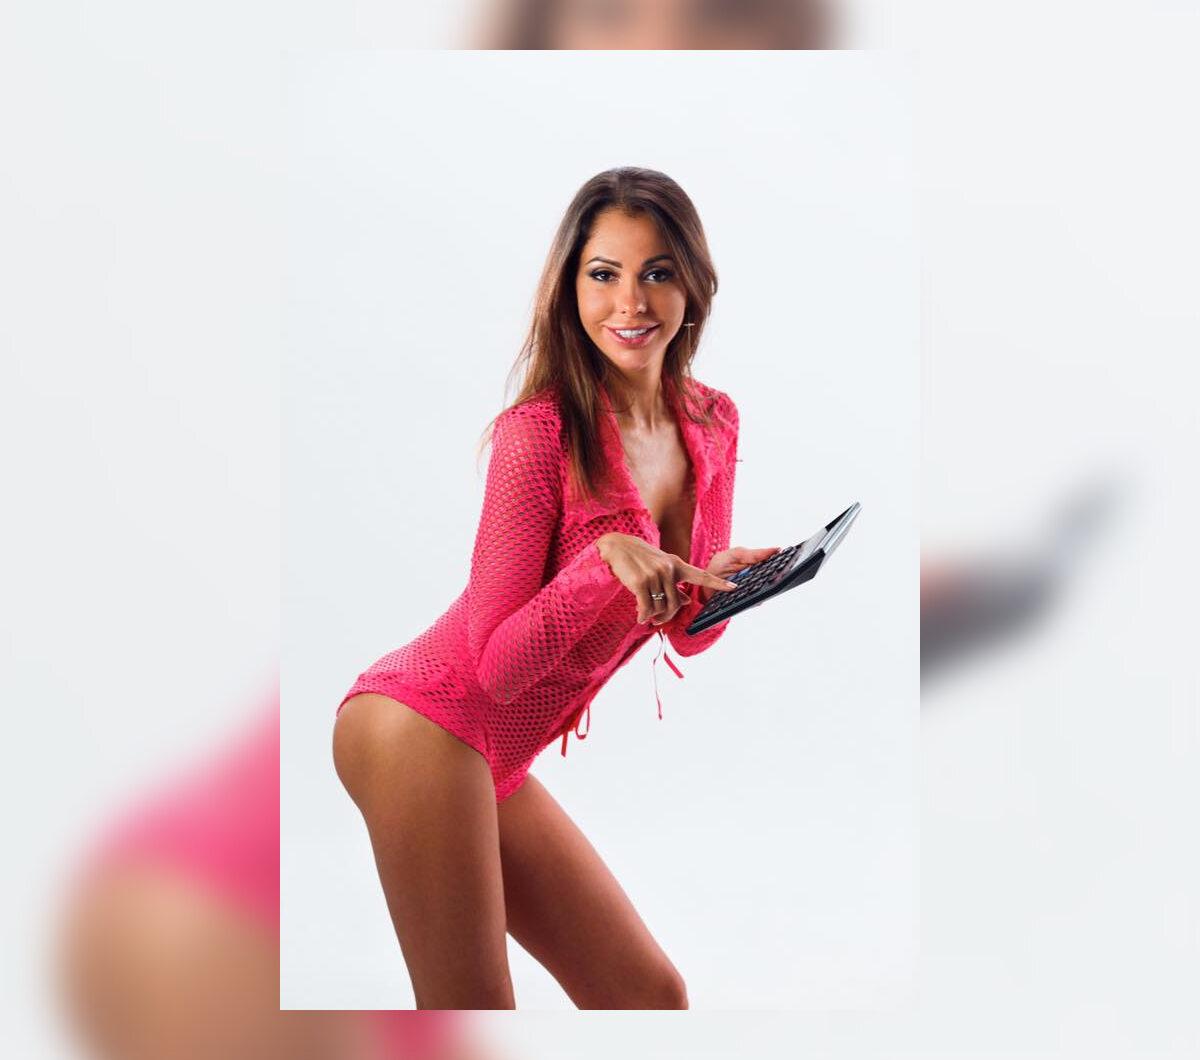 Selfie Elena Berkova naked (84 foto and video), Ass, Leaked, Boobs, braless 2017